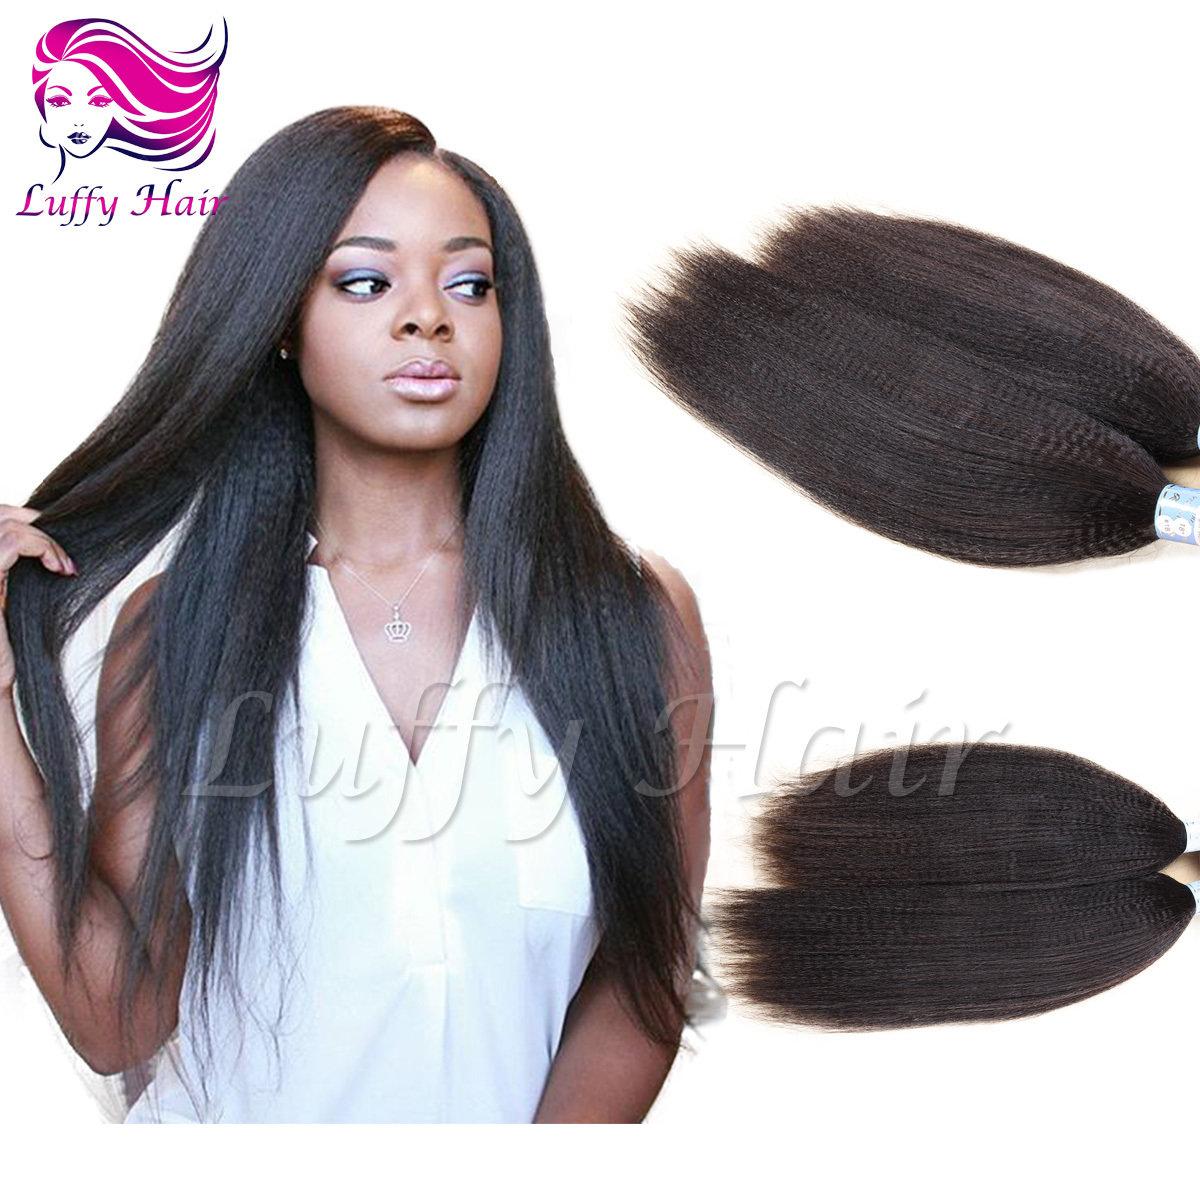 8A Virgin Human Hair Italian Yaki Straight Micro Loop Ring Hair Extensions - KML013